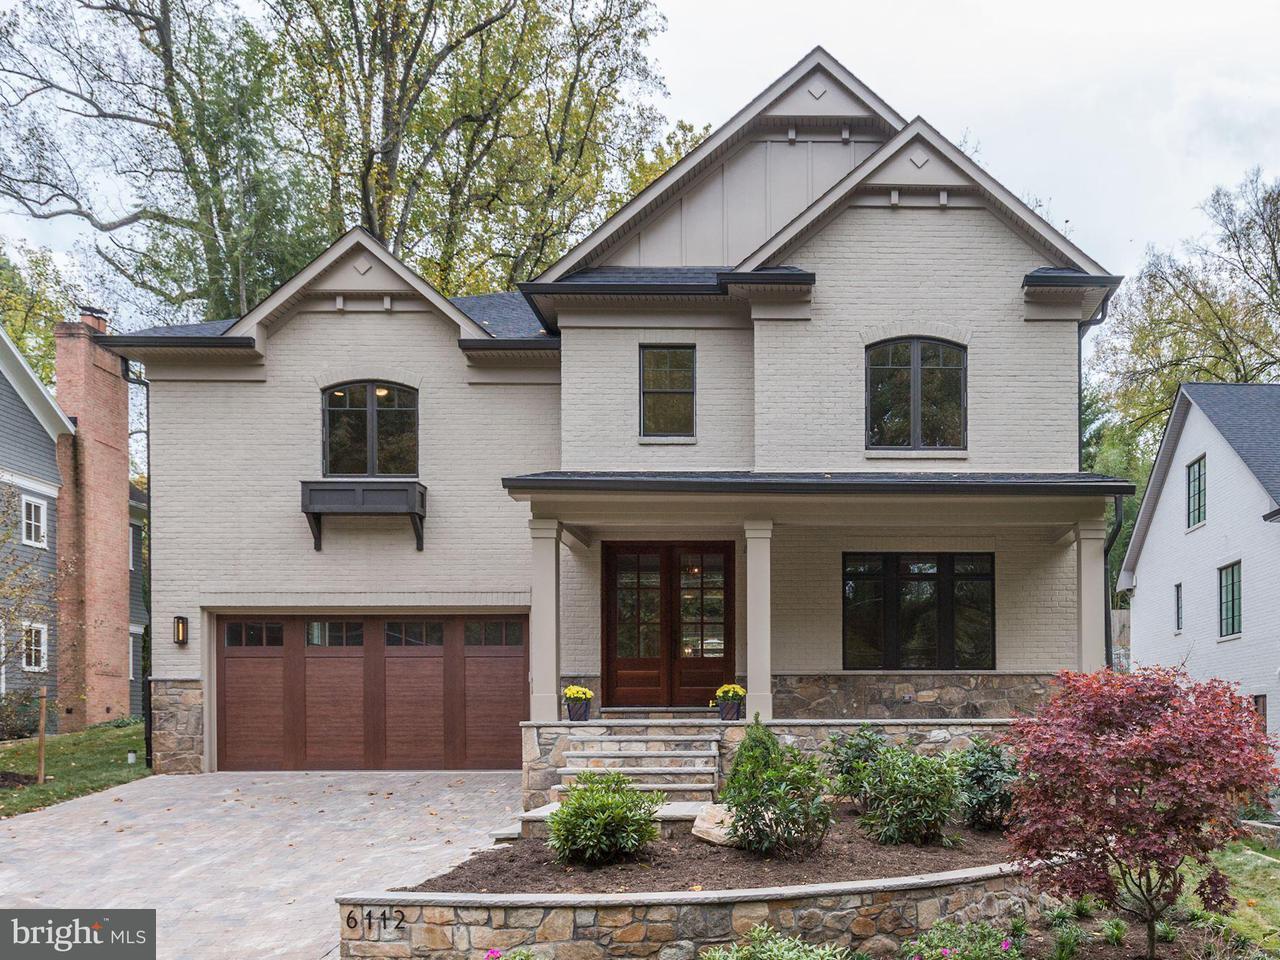 Single Family Home for Sale at 6112 WINNEBAGO Road 6112 WINNEBAGO Road Bethesda, Maryland 20816 United States